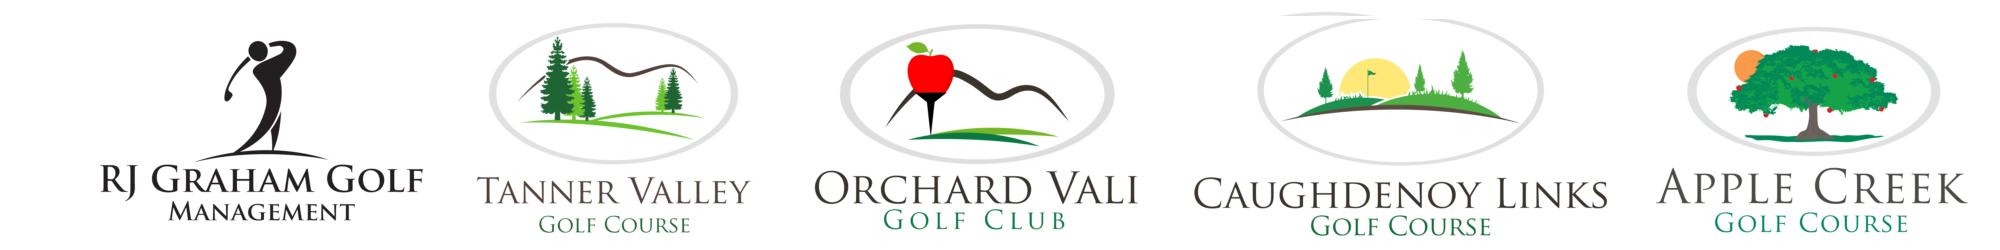 RJ Graham Golf